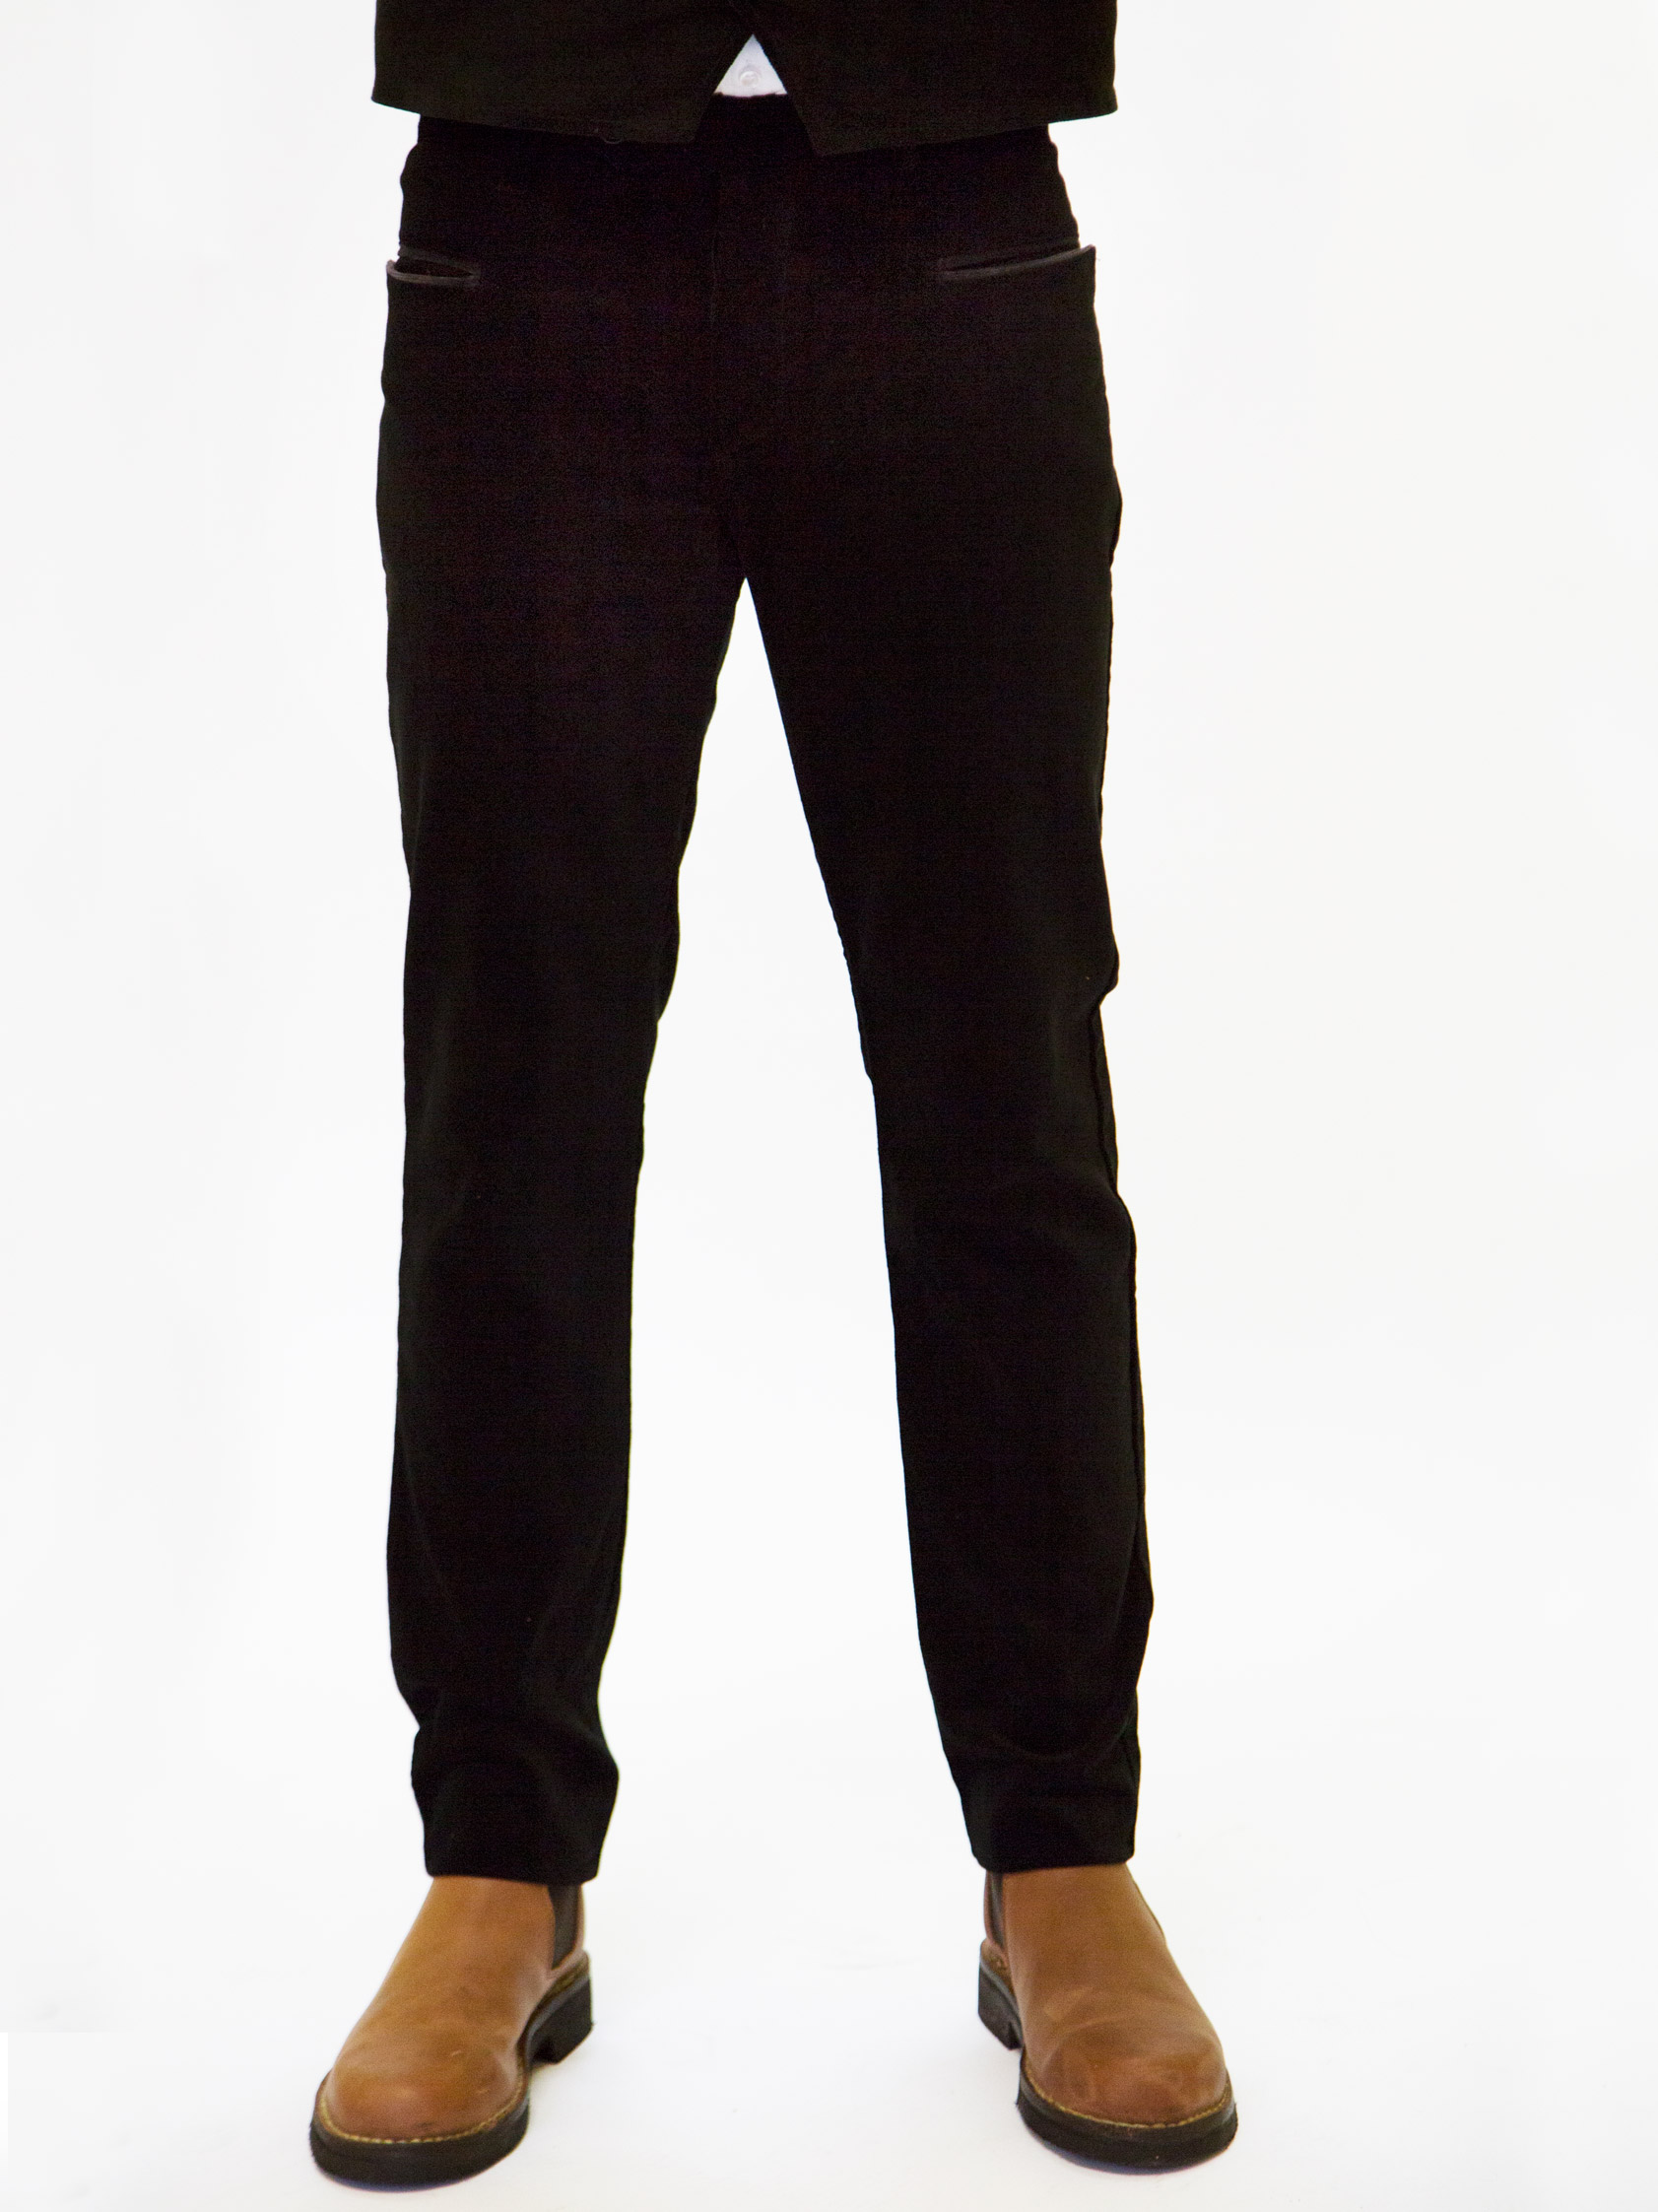 più recente 4589b 8bd06 Pantalone velluto Visconti liscio uomo